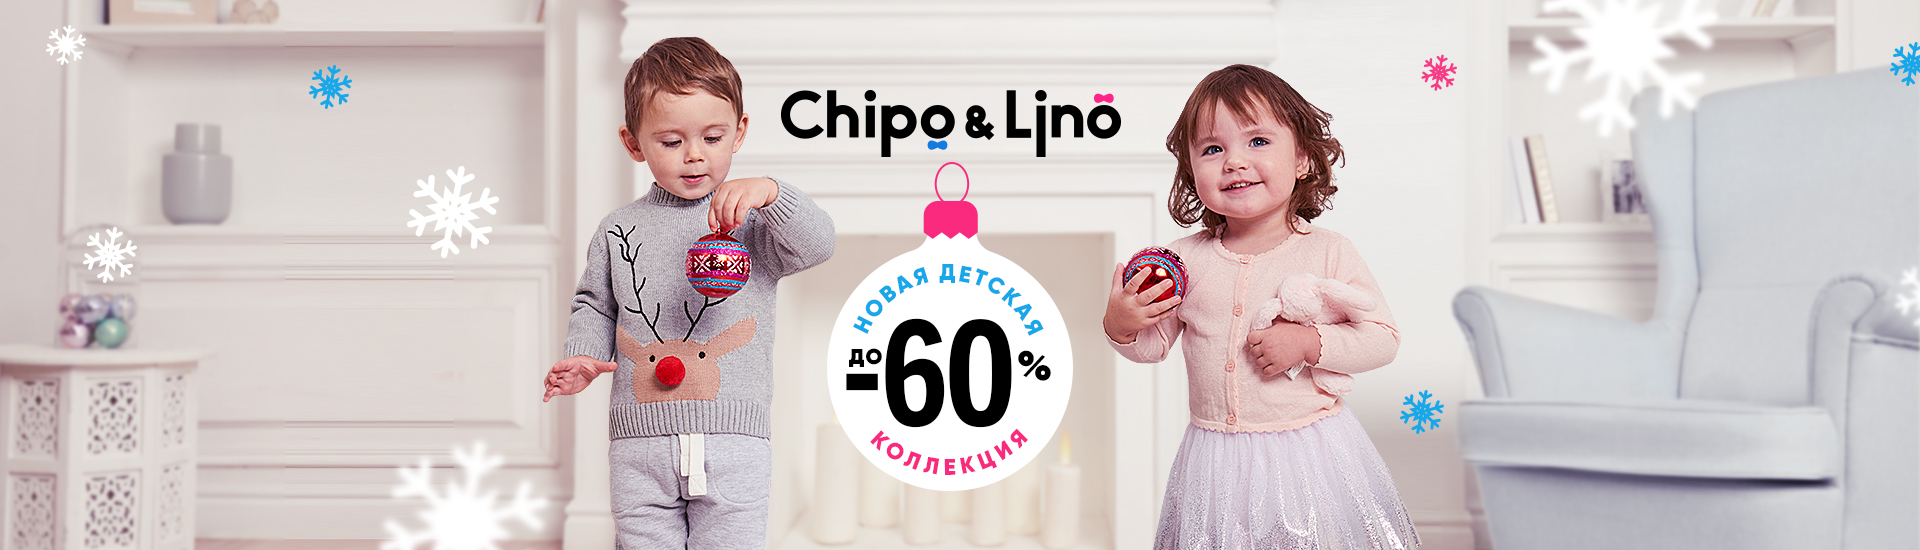 Chipo&Lino